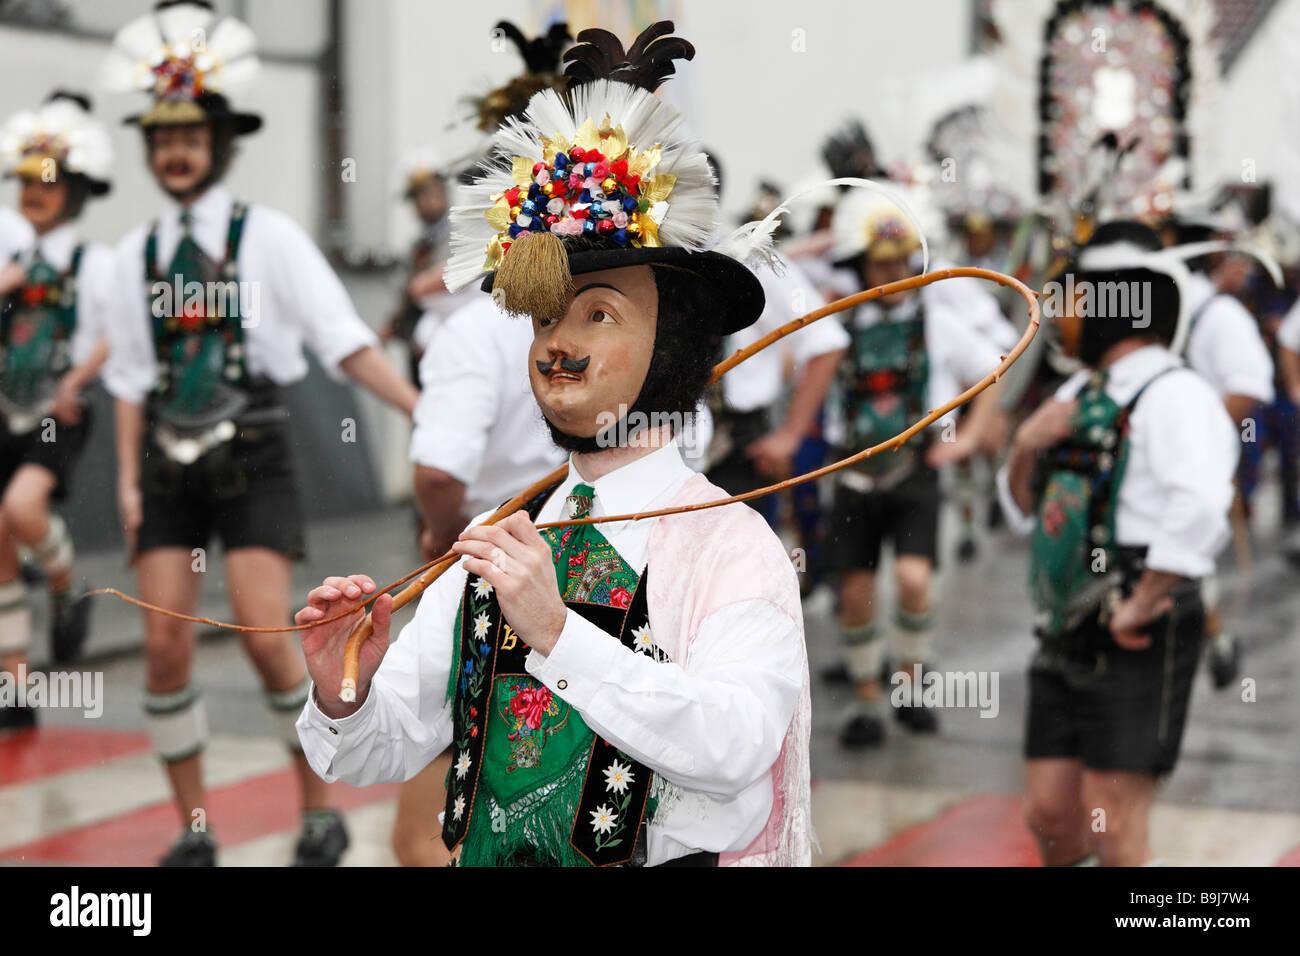 Mullerlaufen parade in Thaur, carnival tradition, Tyrol, Austria - Stock Image